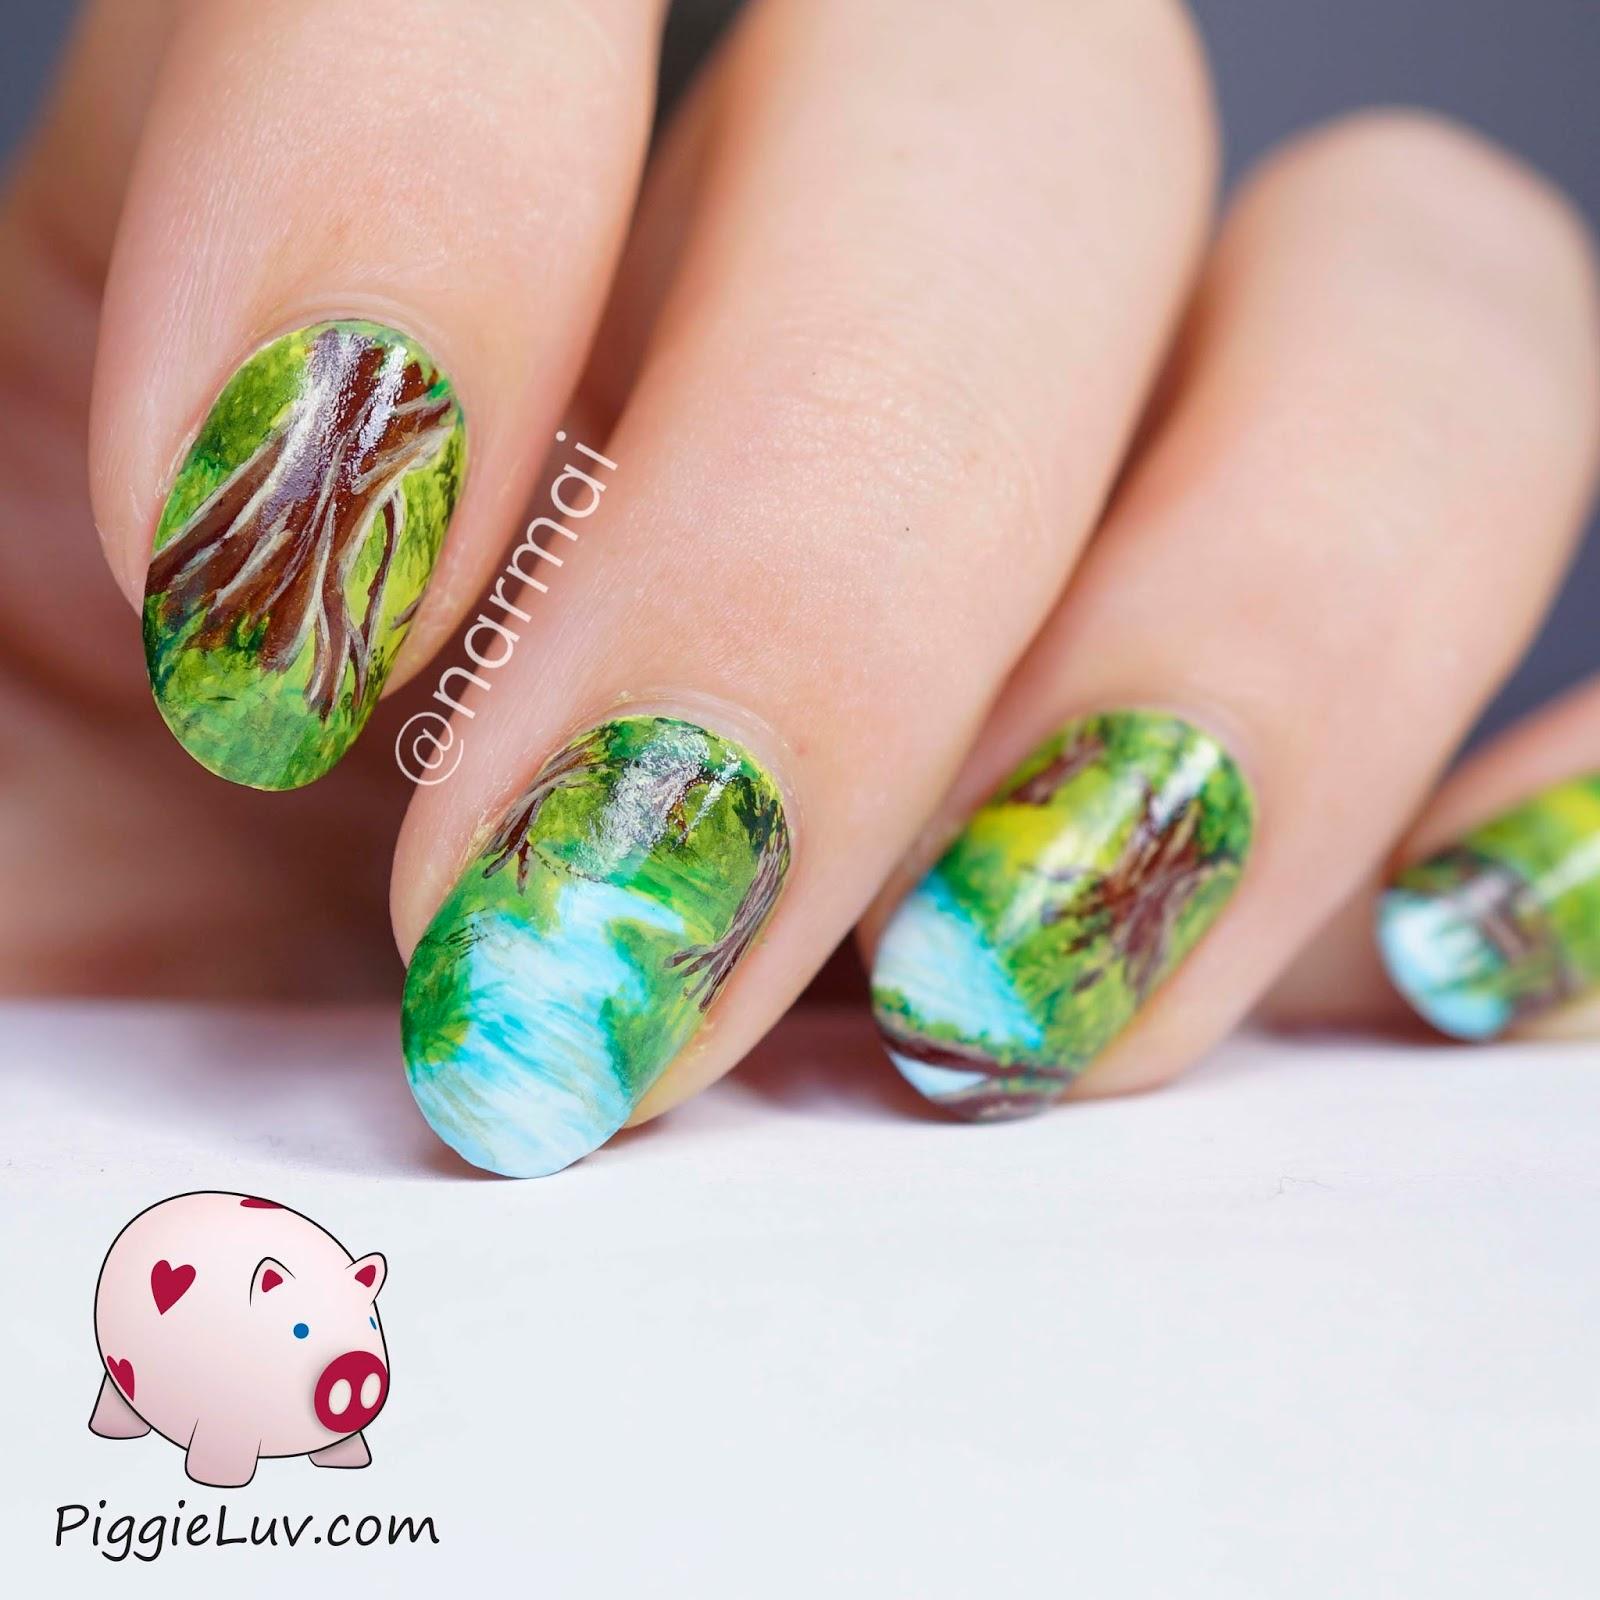 Piggieluv Freehand Forest Sprites Nail Art